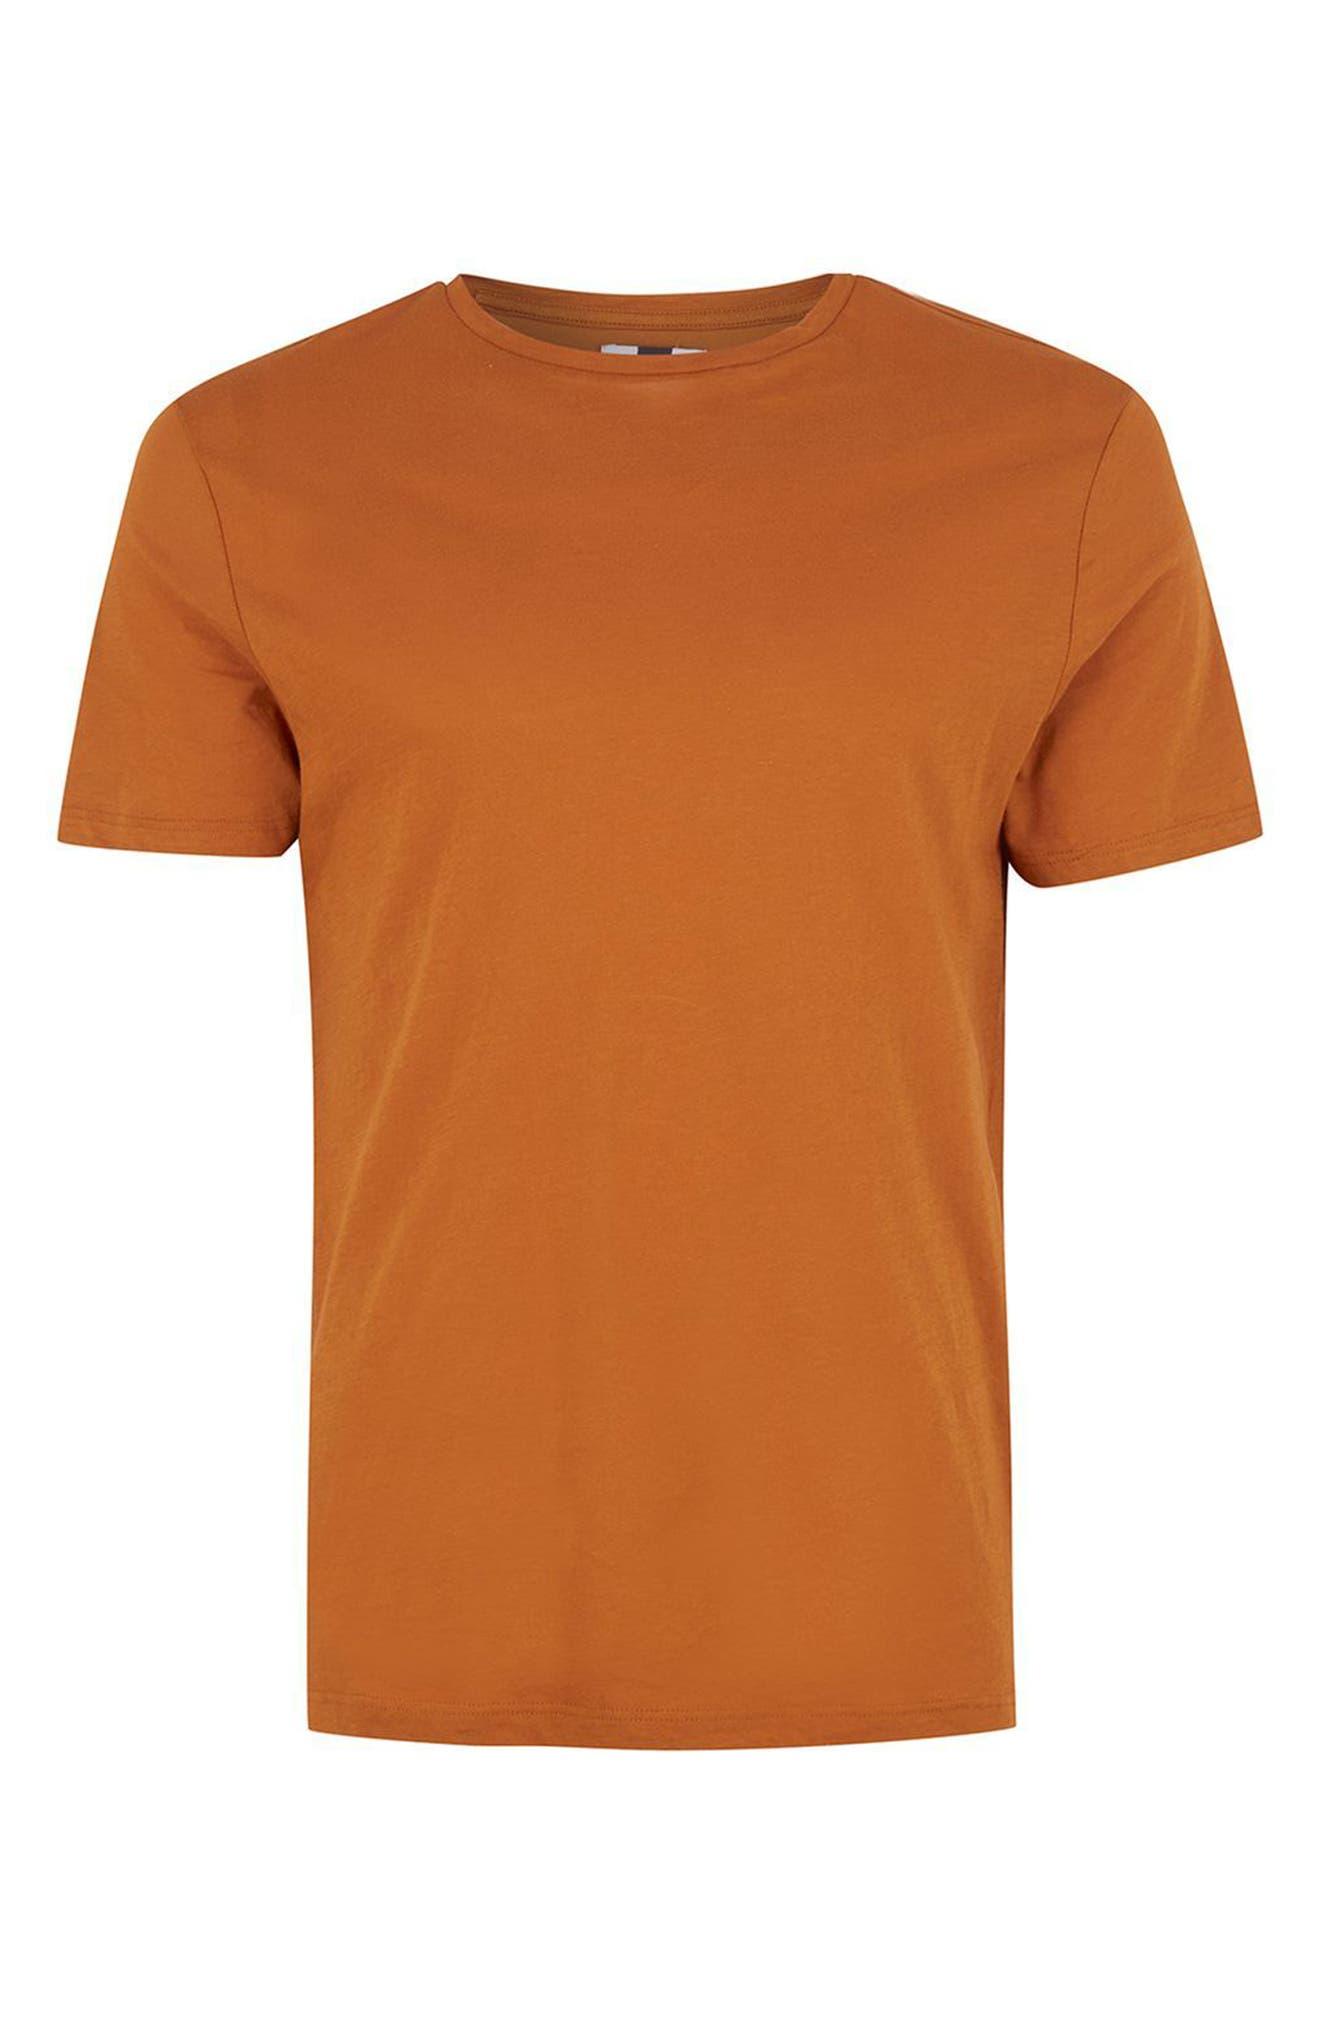 Crewneck T-Shirt,                             Alternate thumbnail 4, color,                             Rust Orange